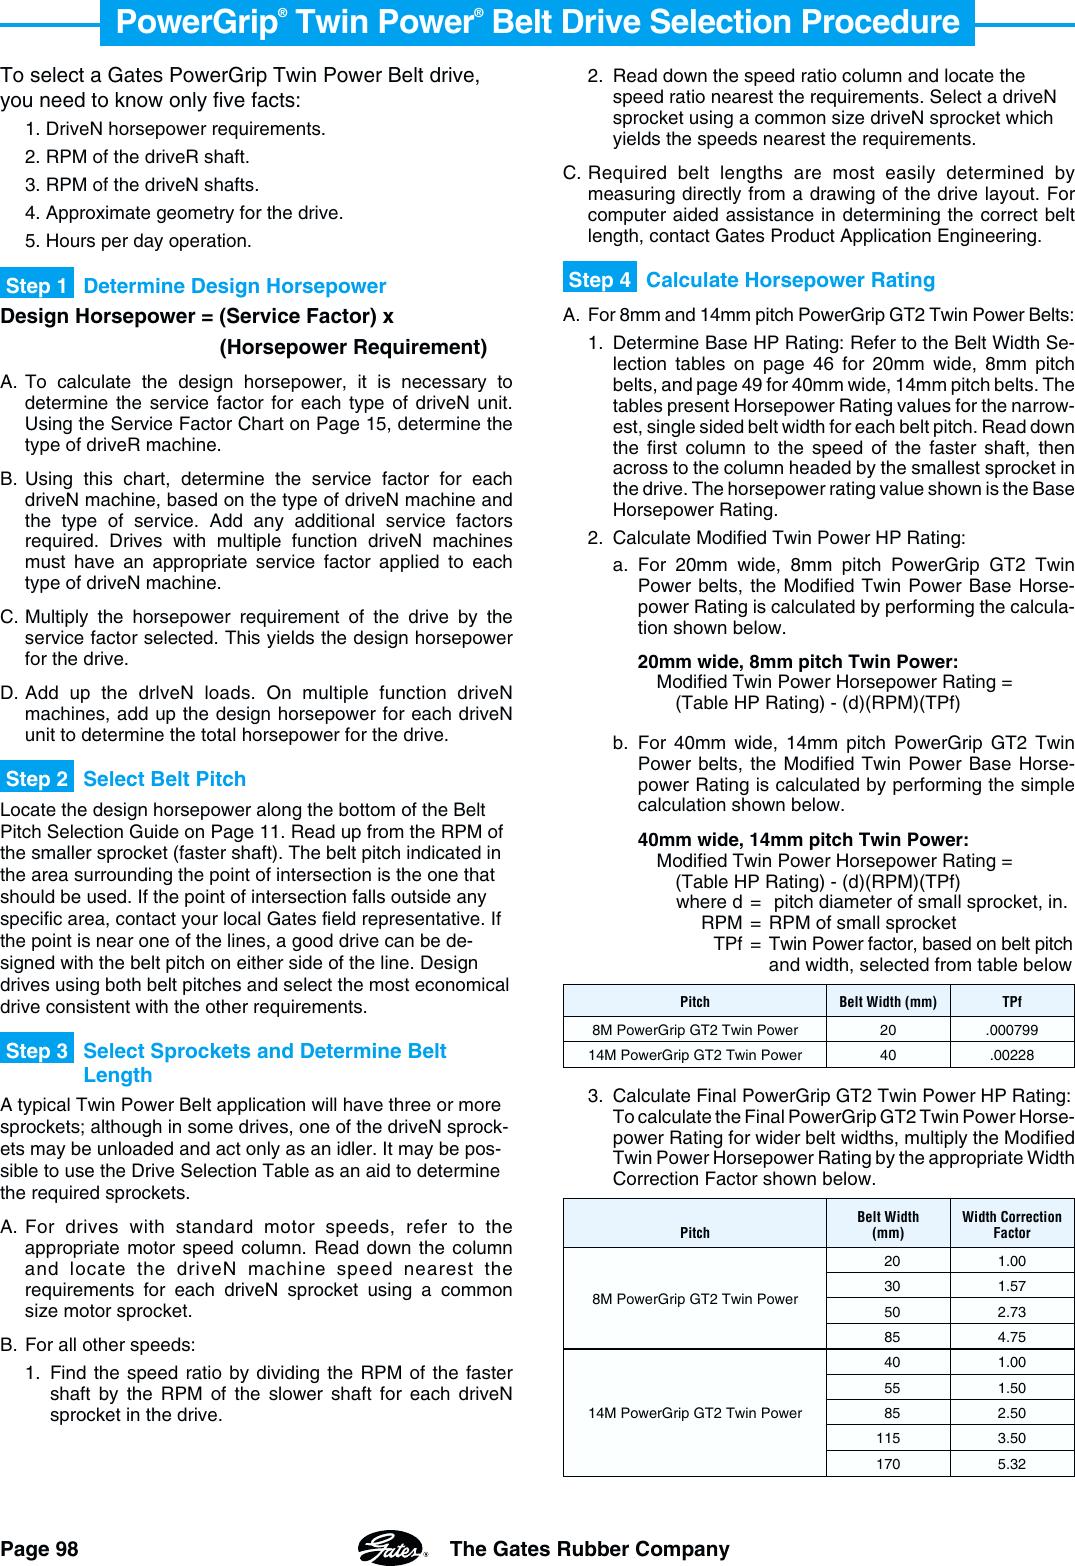 Gates Corporation Powergrip Belt Drives Gt2 Users Manual PowerGrip